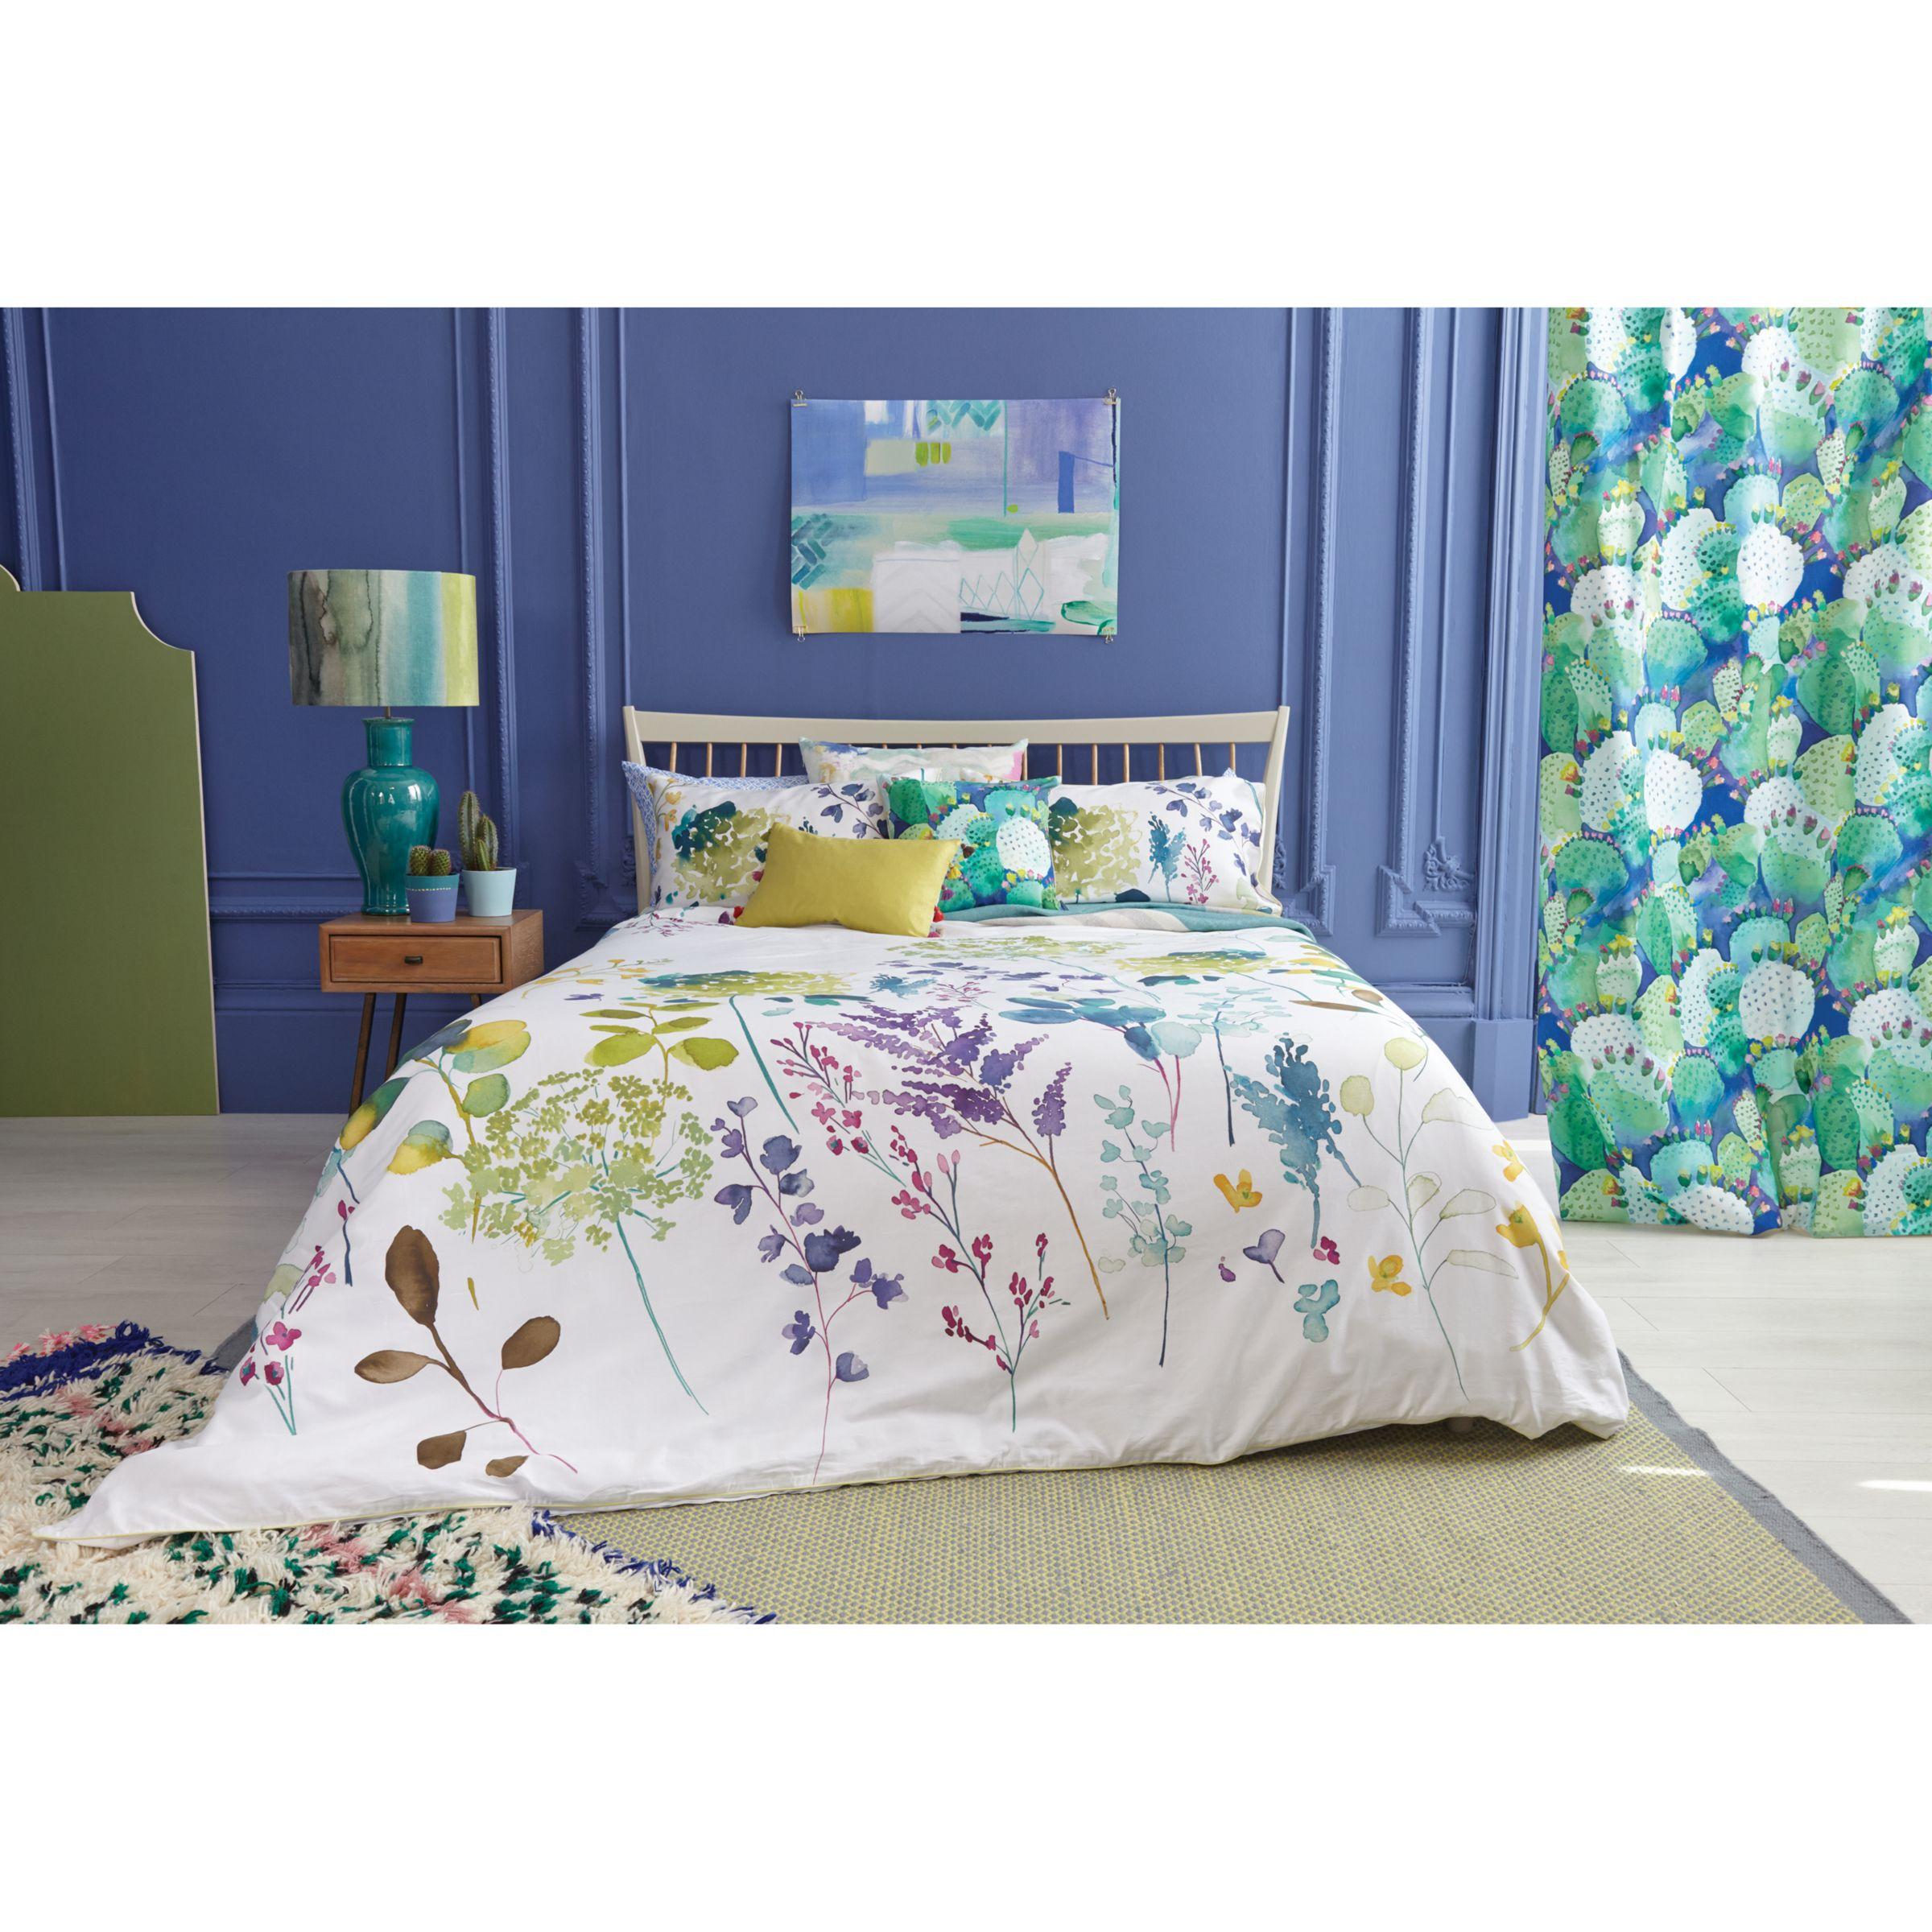 bluebellgray bluebellgray Botanical Print Cotton Duvet Cover and Pillowcase Set